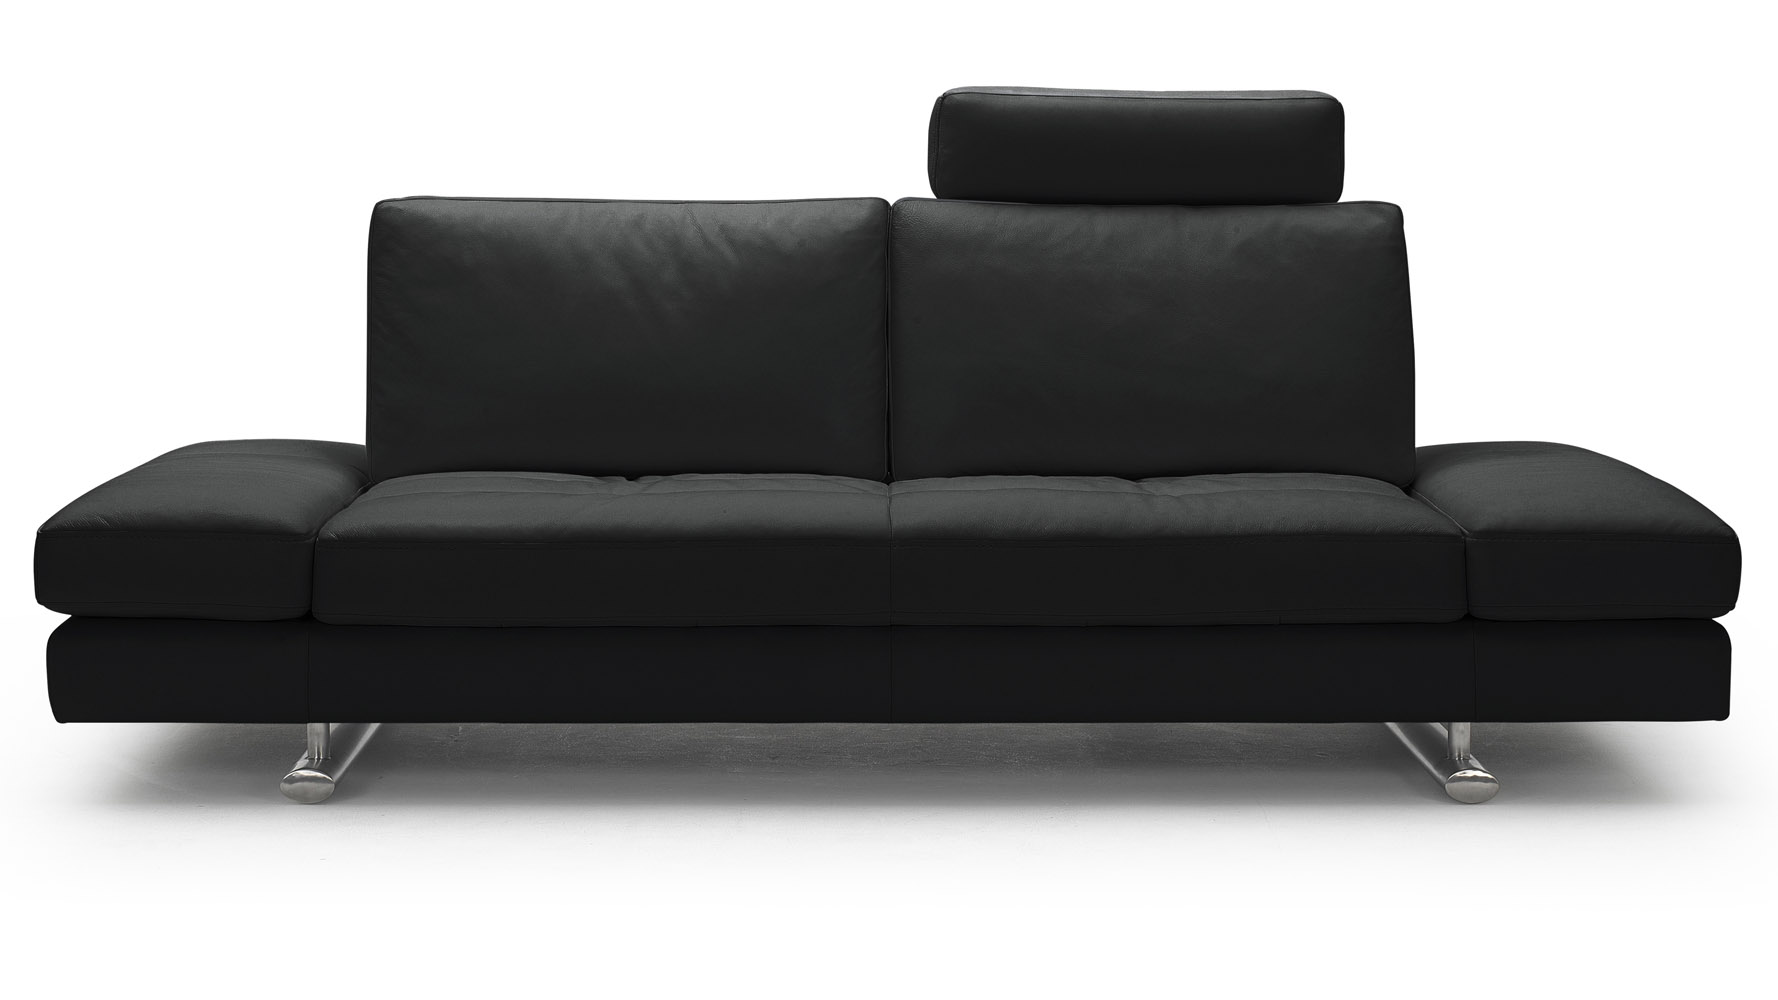 Bentley Black Top Grain Leather Modern Sofa Set With Loveseat | Zuri ...